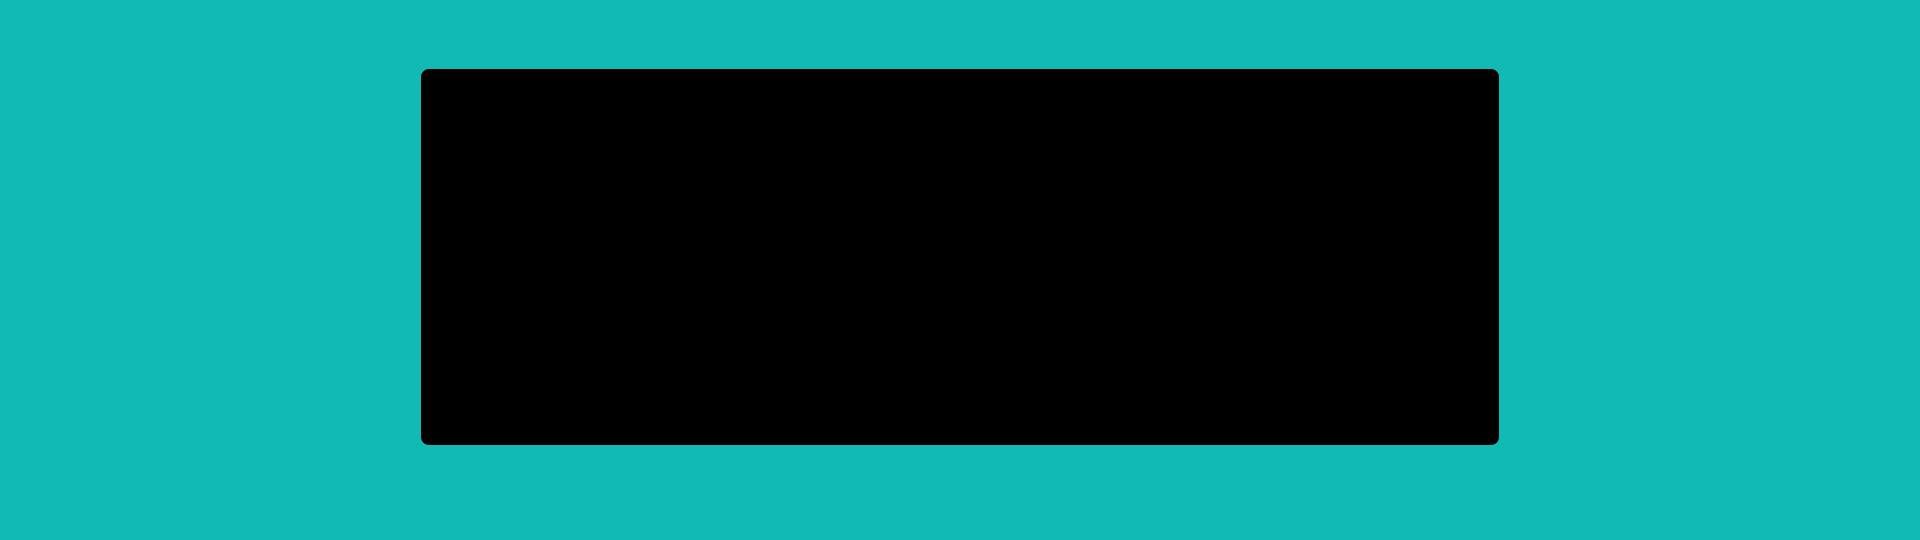 CATEGORY-KITAP-KISINDIRIMIKITAPGUNLERI-25-02